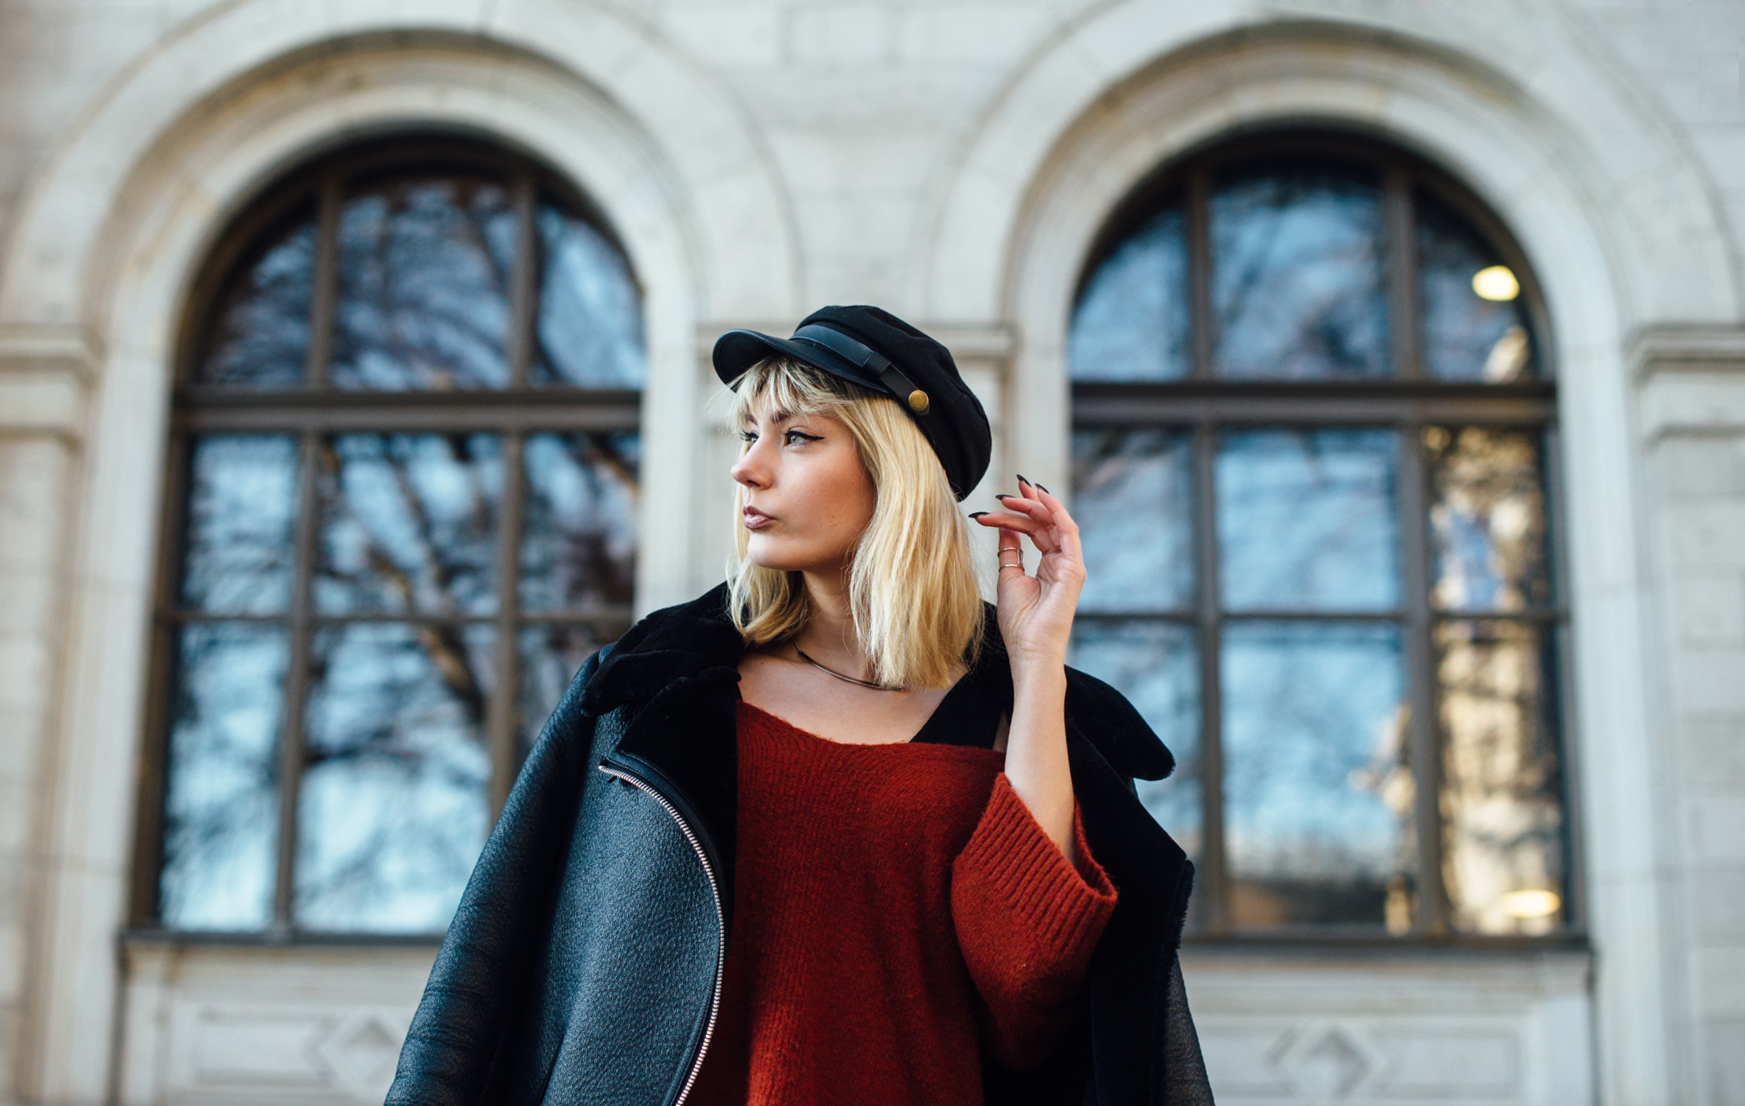 04-Kiamisu-Modeblog-Fashion Week Berlin_Shearling Jacke_Tamaris Stiefeletten_Schiebermütze-6